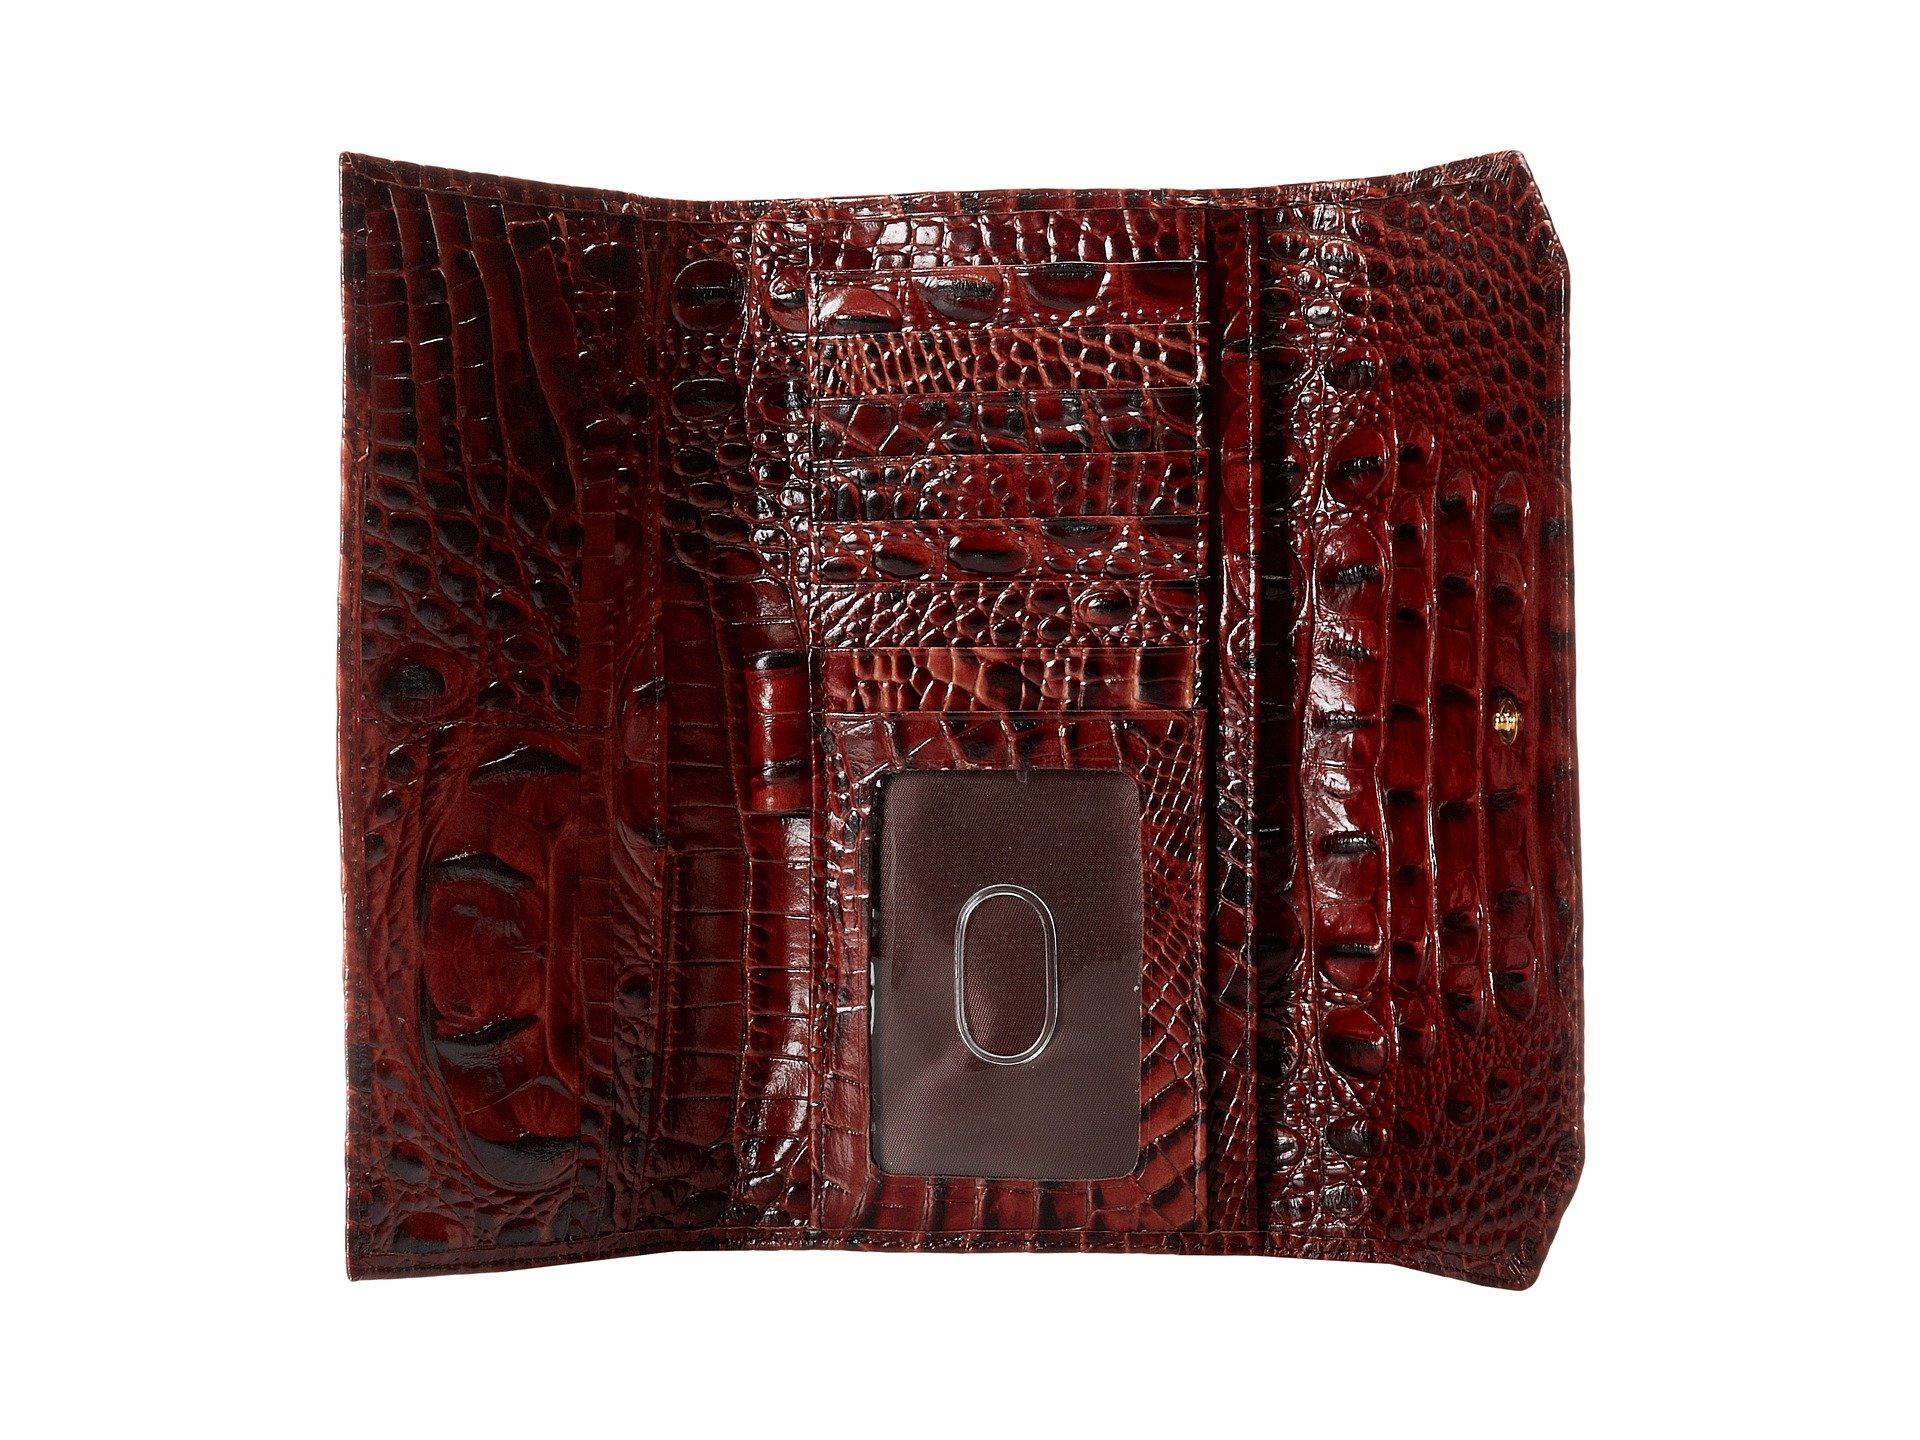 Melbourne Soft Brahmin Wallet Checkbook Pecan gd5w8qpwx